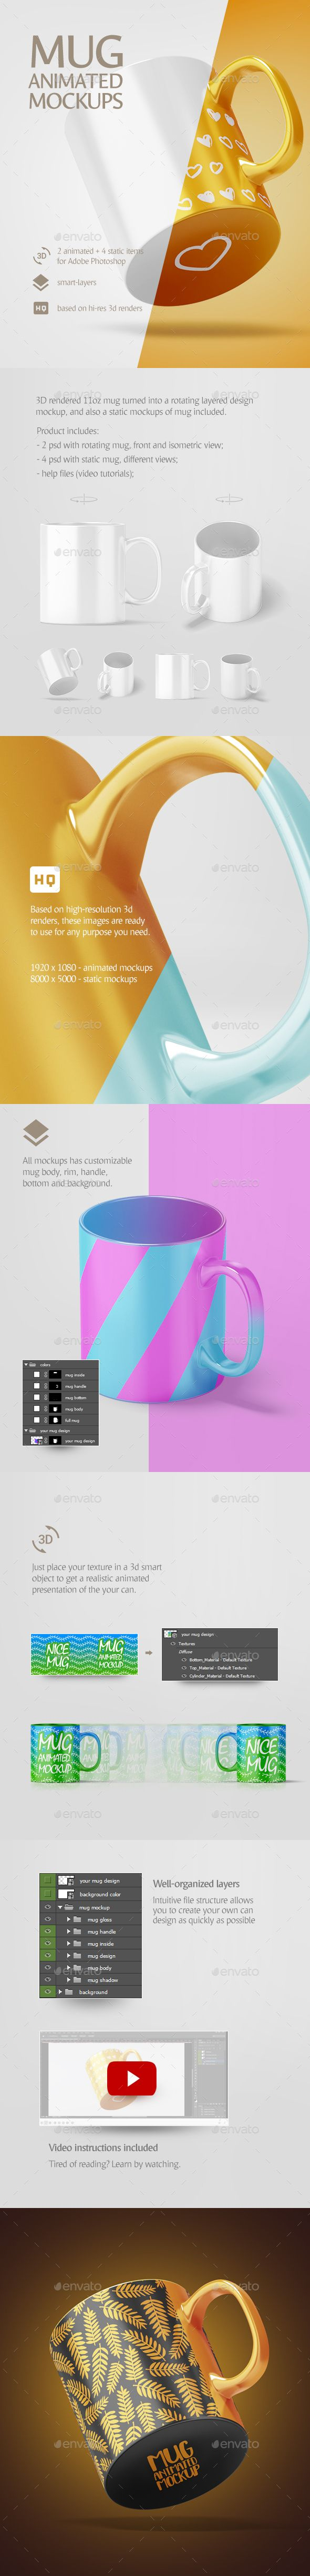 Print Mockup - Mug Animated Mockup - Print Mockup by rebrandy.   #BlackFriday #TuesdayWisdom #PresentationTemplate#TuesdayFeeling #TuesdayThoughts #DesignTemplate #TuesdayMotivation #UIUX #WebElements #HappyTuesday #Graphic #UserInterface #CyberMonday #Logo #Vectors